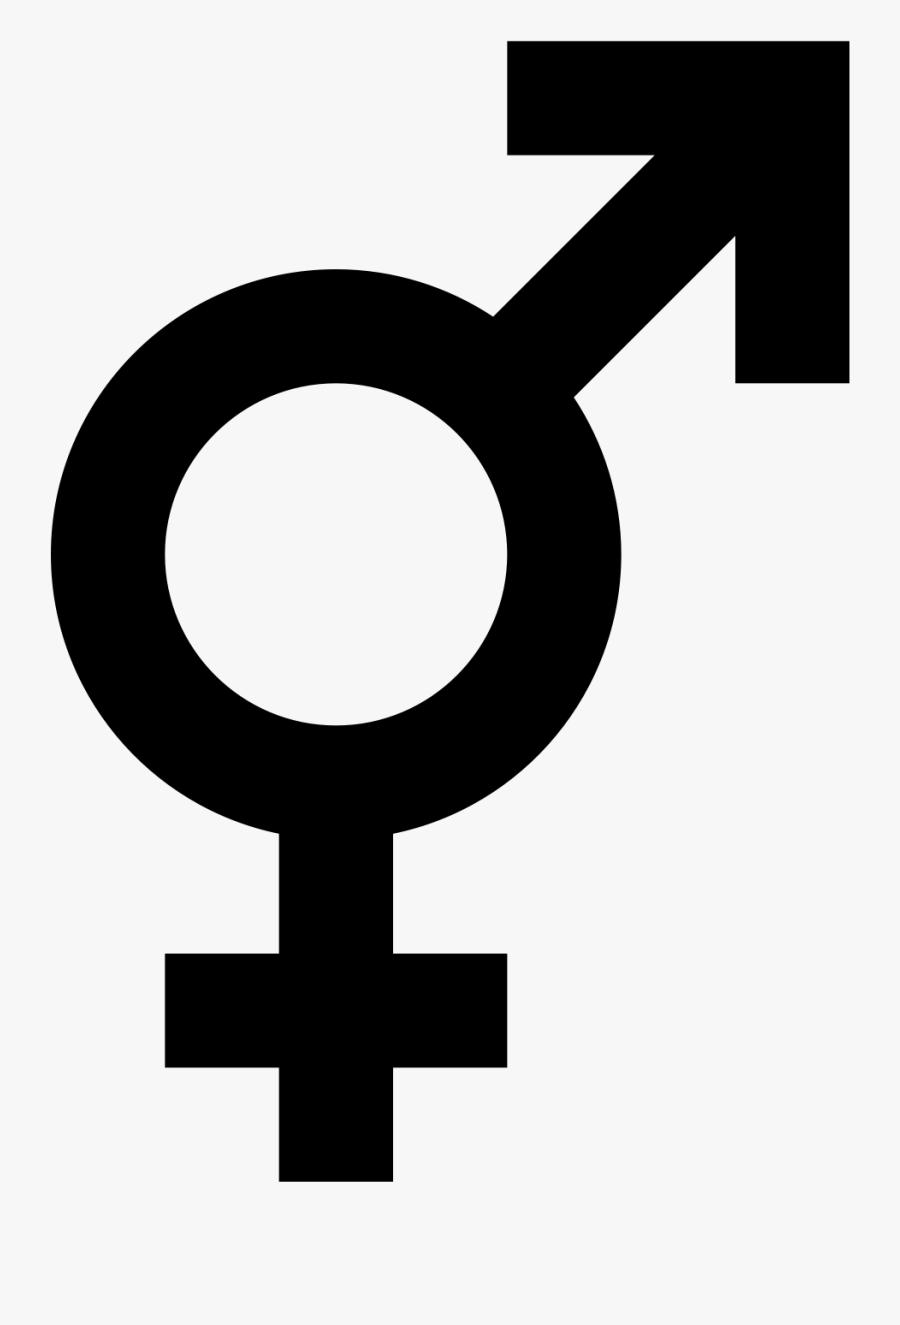 Male Female Symbol Png, Transparent Clipart